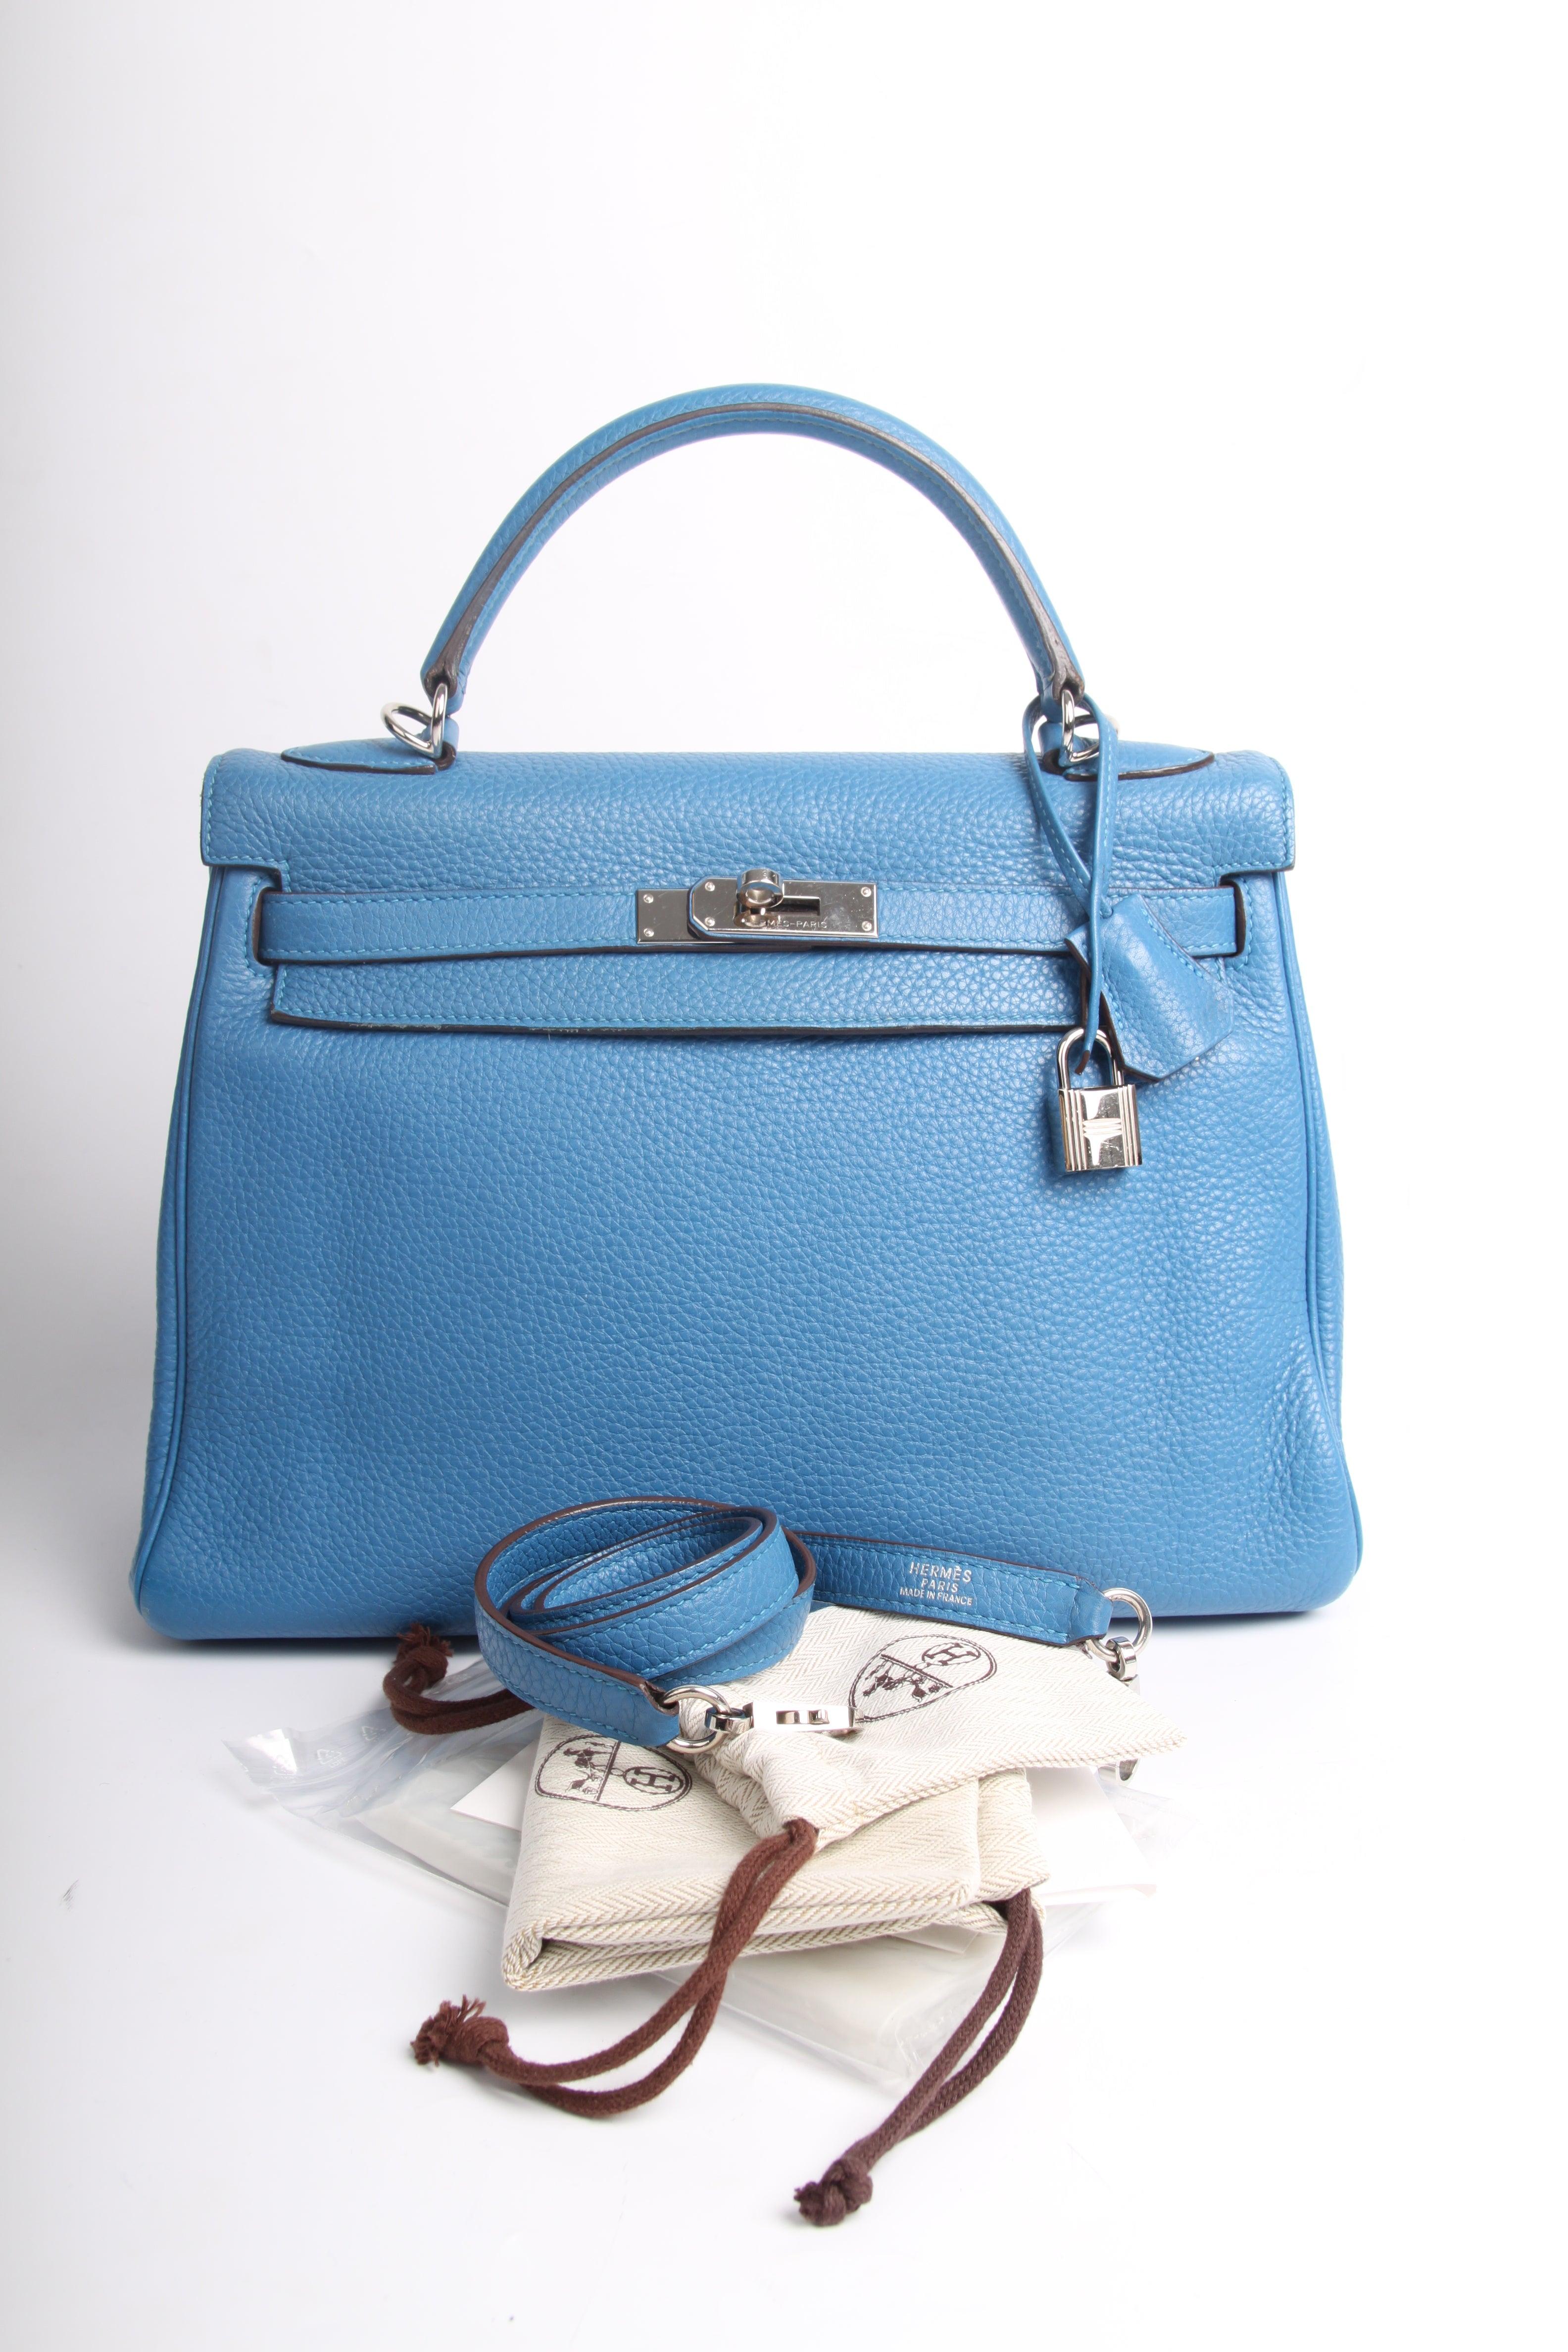 8211ddd49bb4 Hermes Kelly 32 Togo Leather - Izmir Blue at 1stdibs